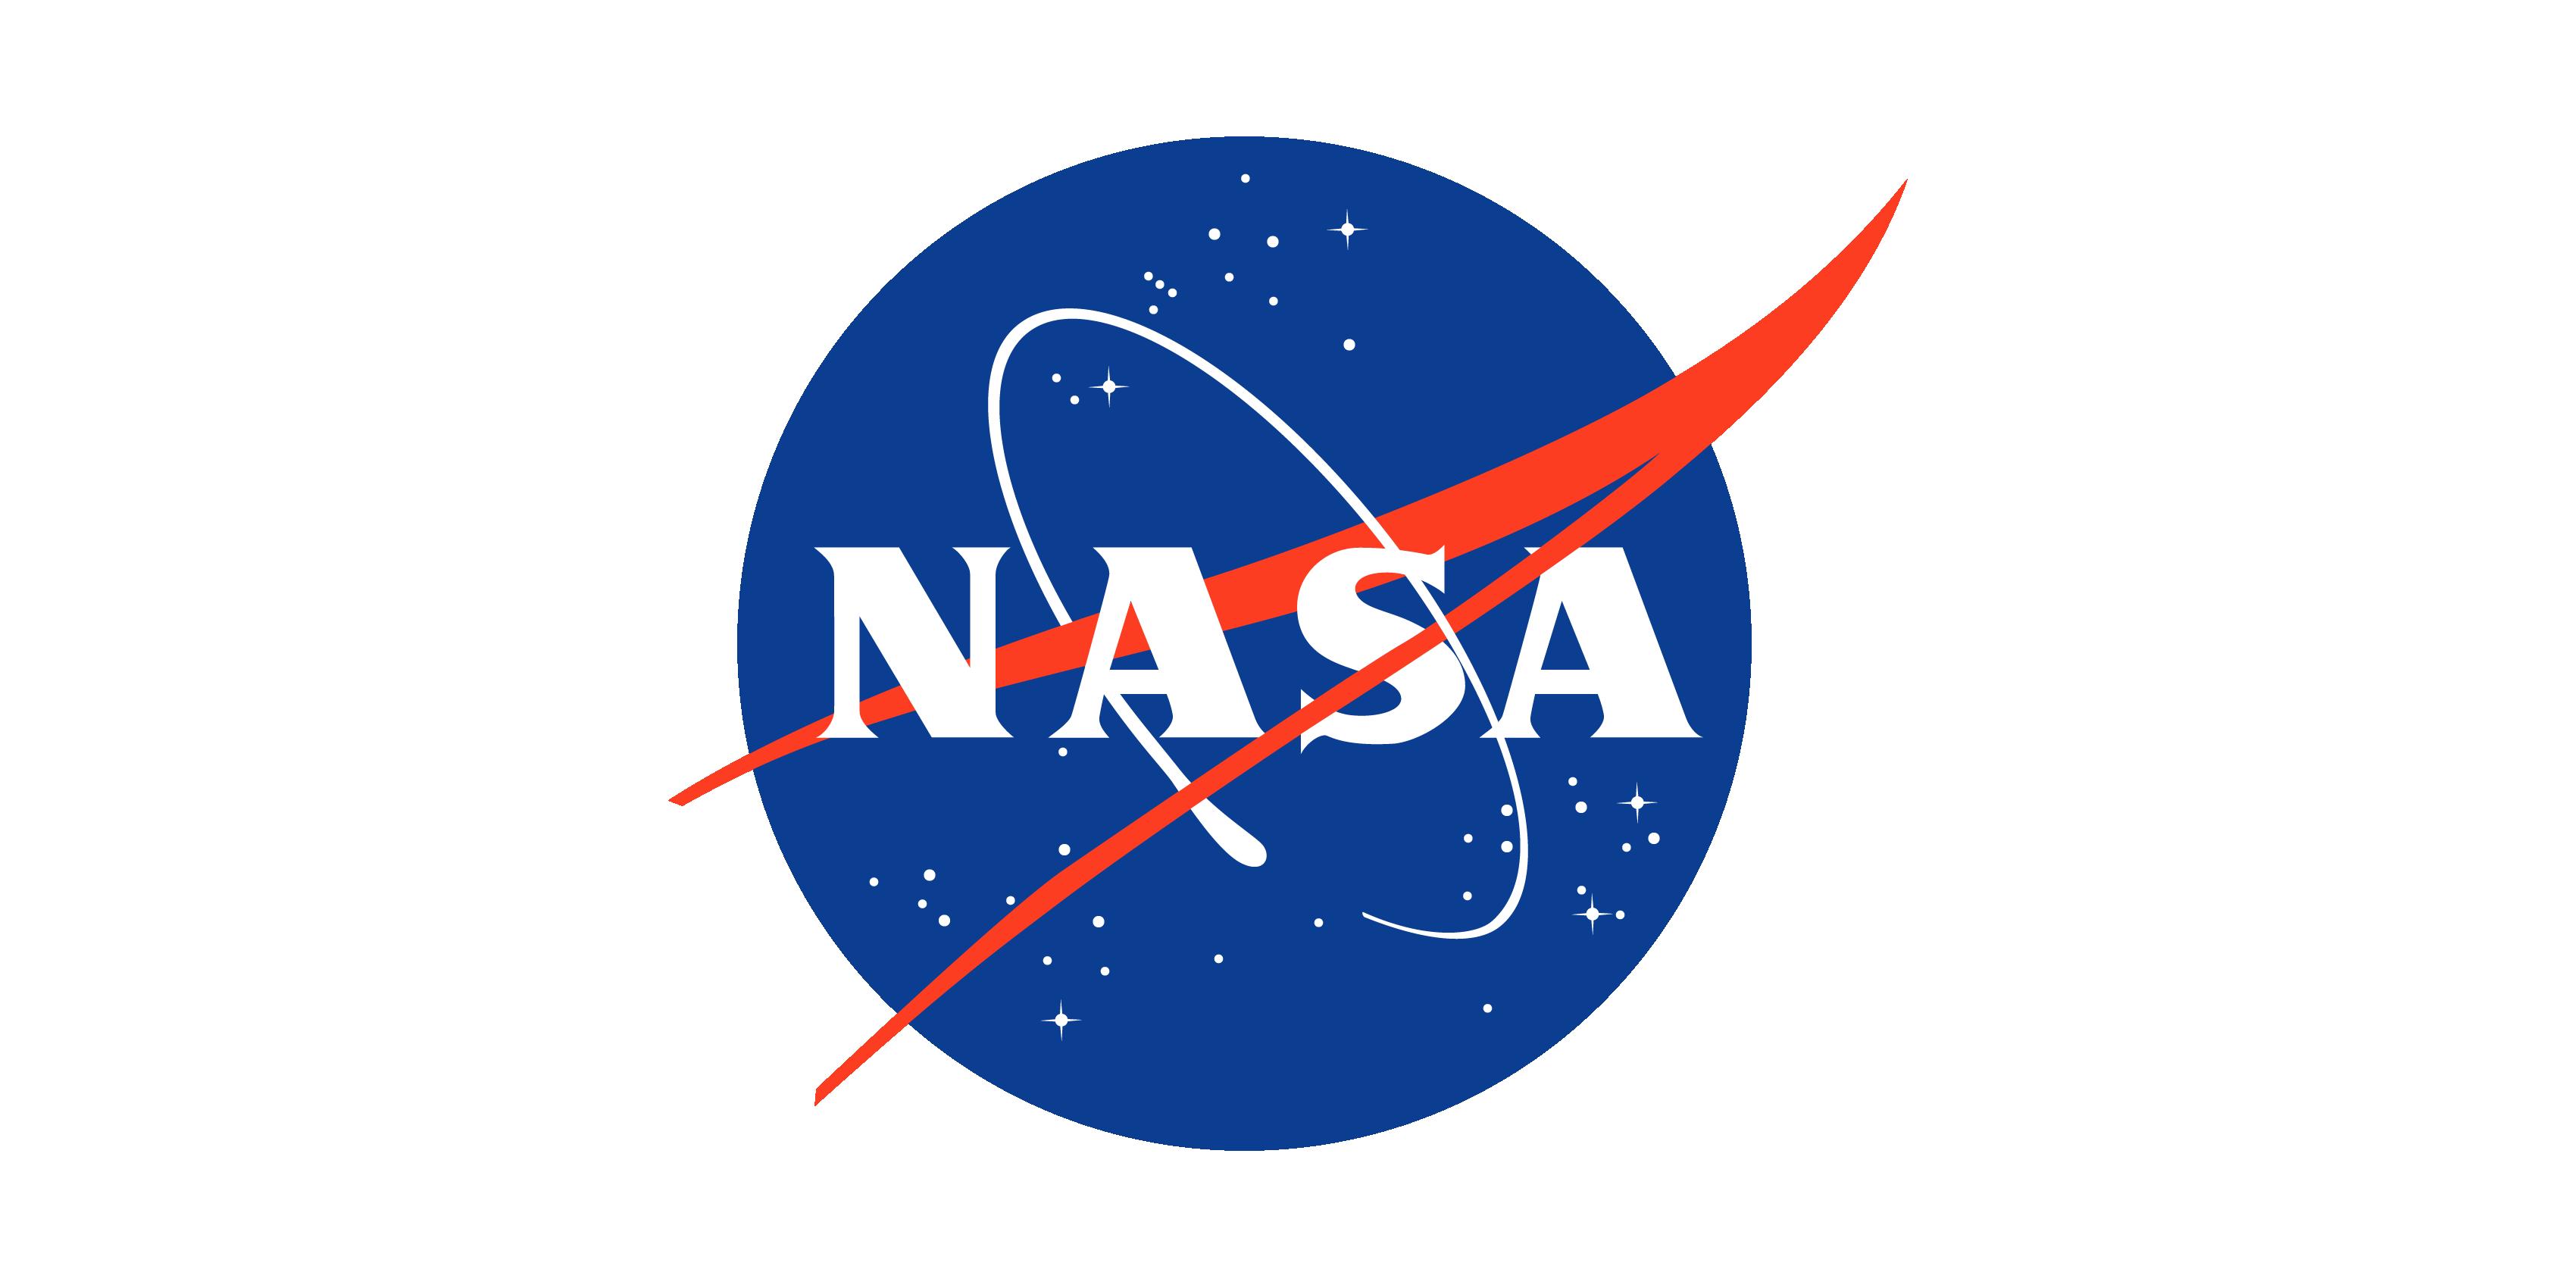 Future clipart space mission. Symbols of nasa logo